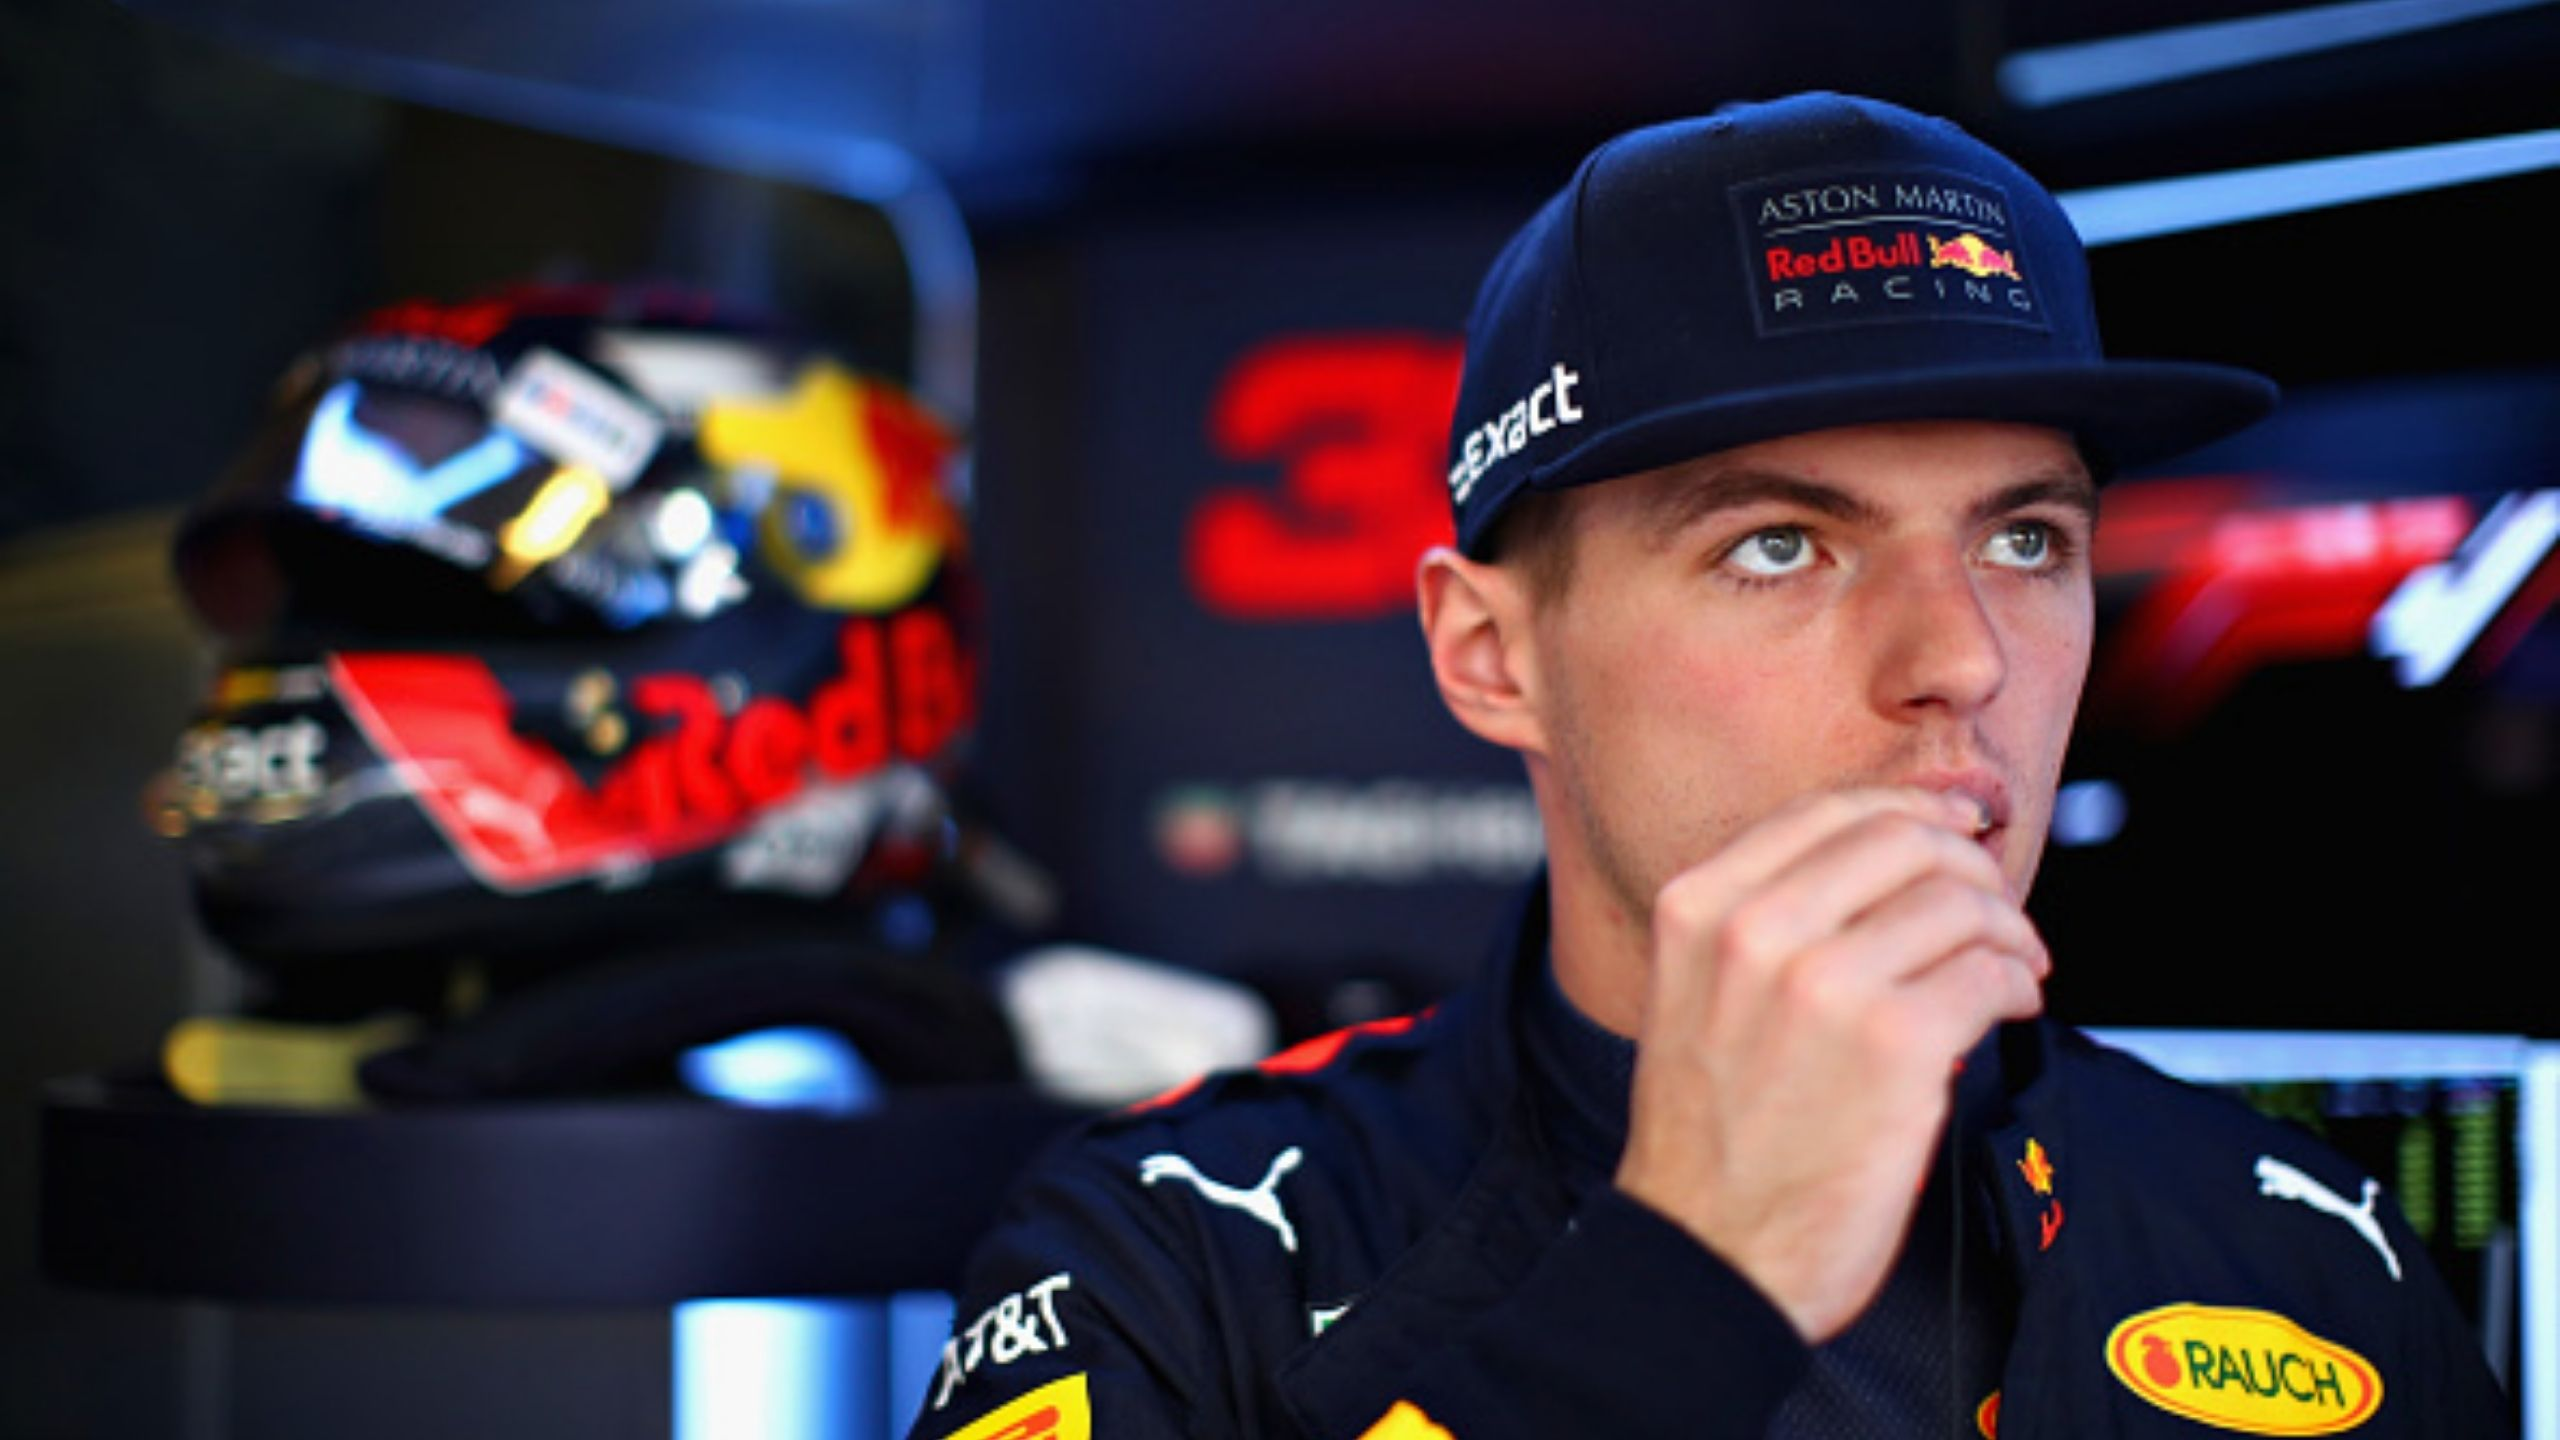 Red Bull's Max Verstappen purchases a private jet from Virgin Group boss Richard Branson